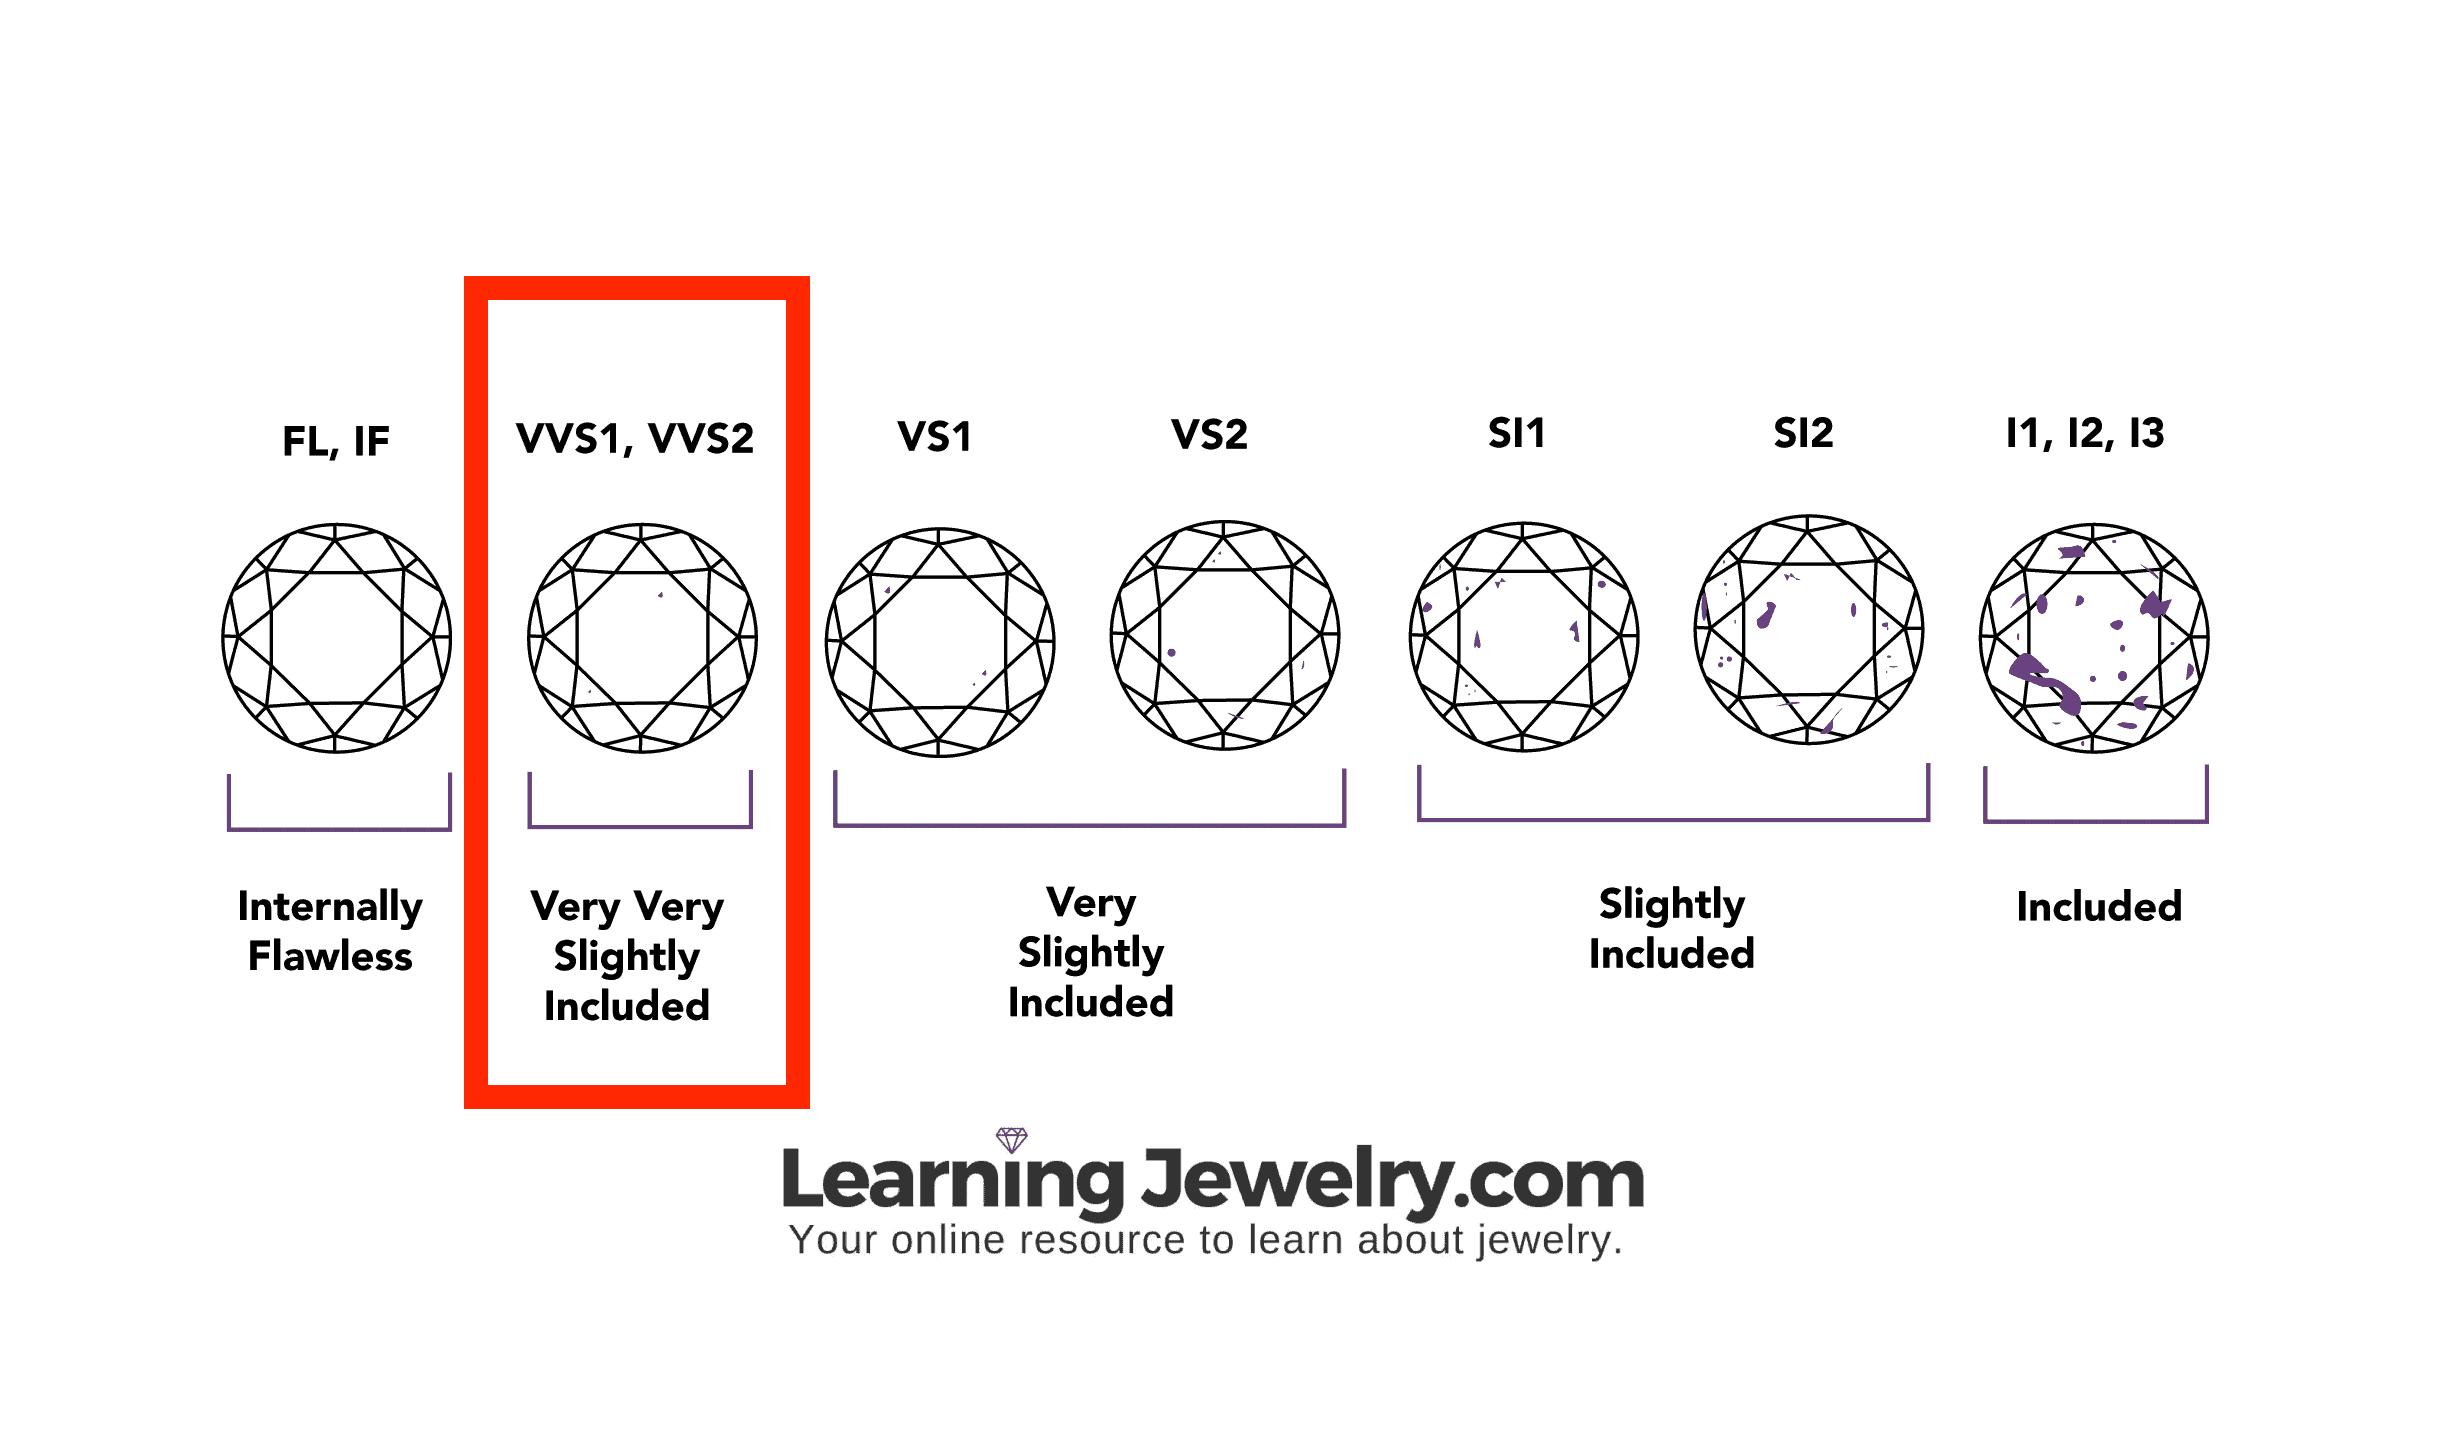 learning jewelry diamond clarity scale